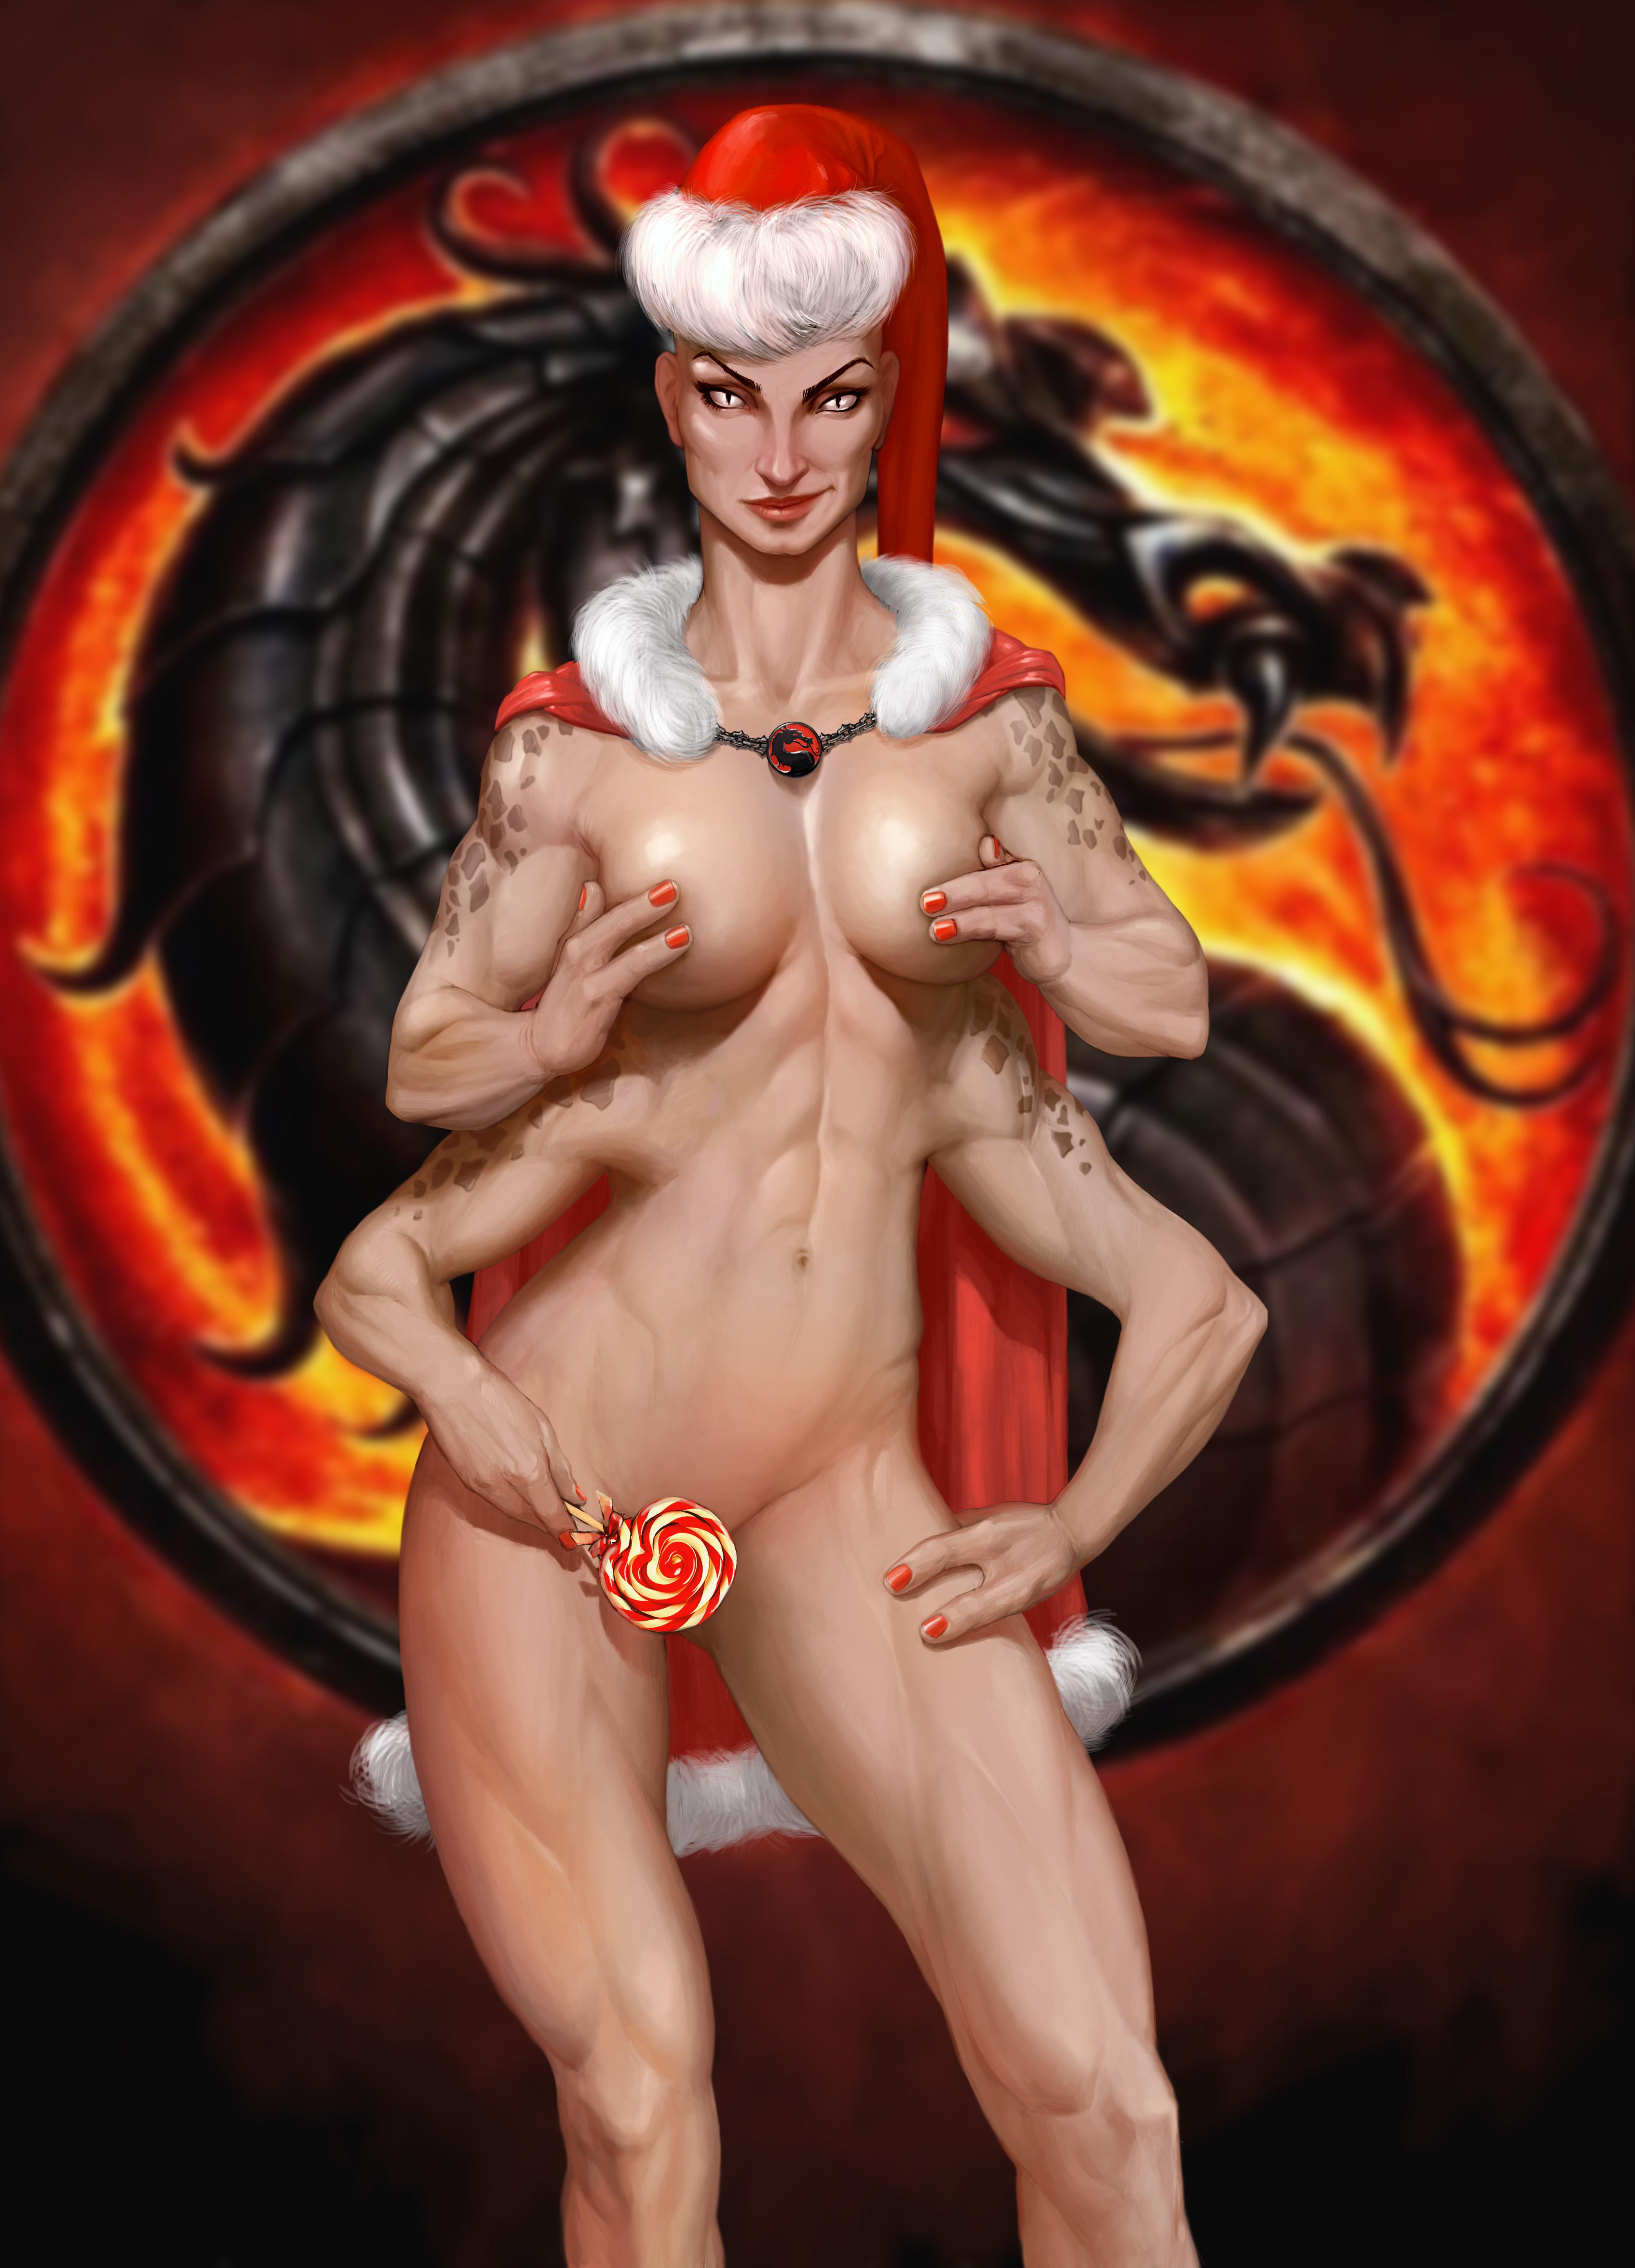 Sexy mortal kombat girls fan art nude pic